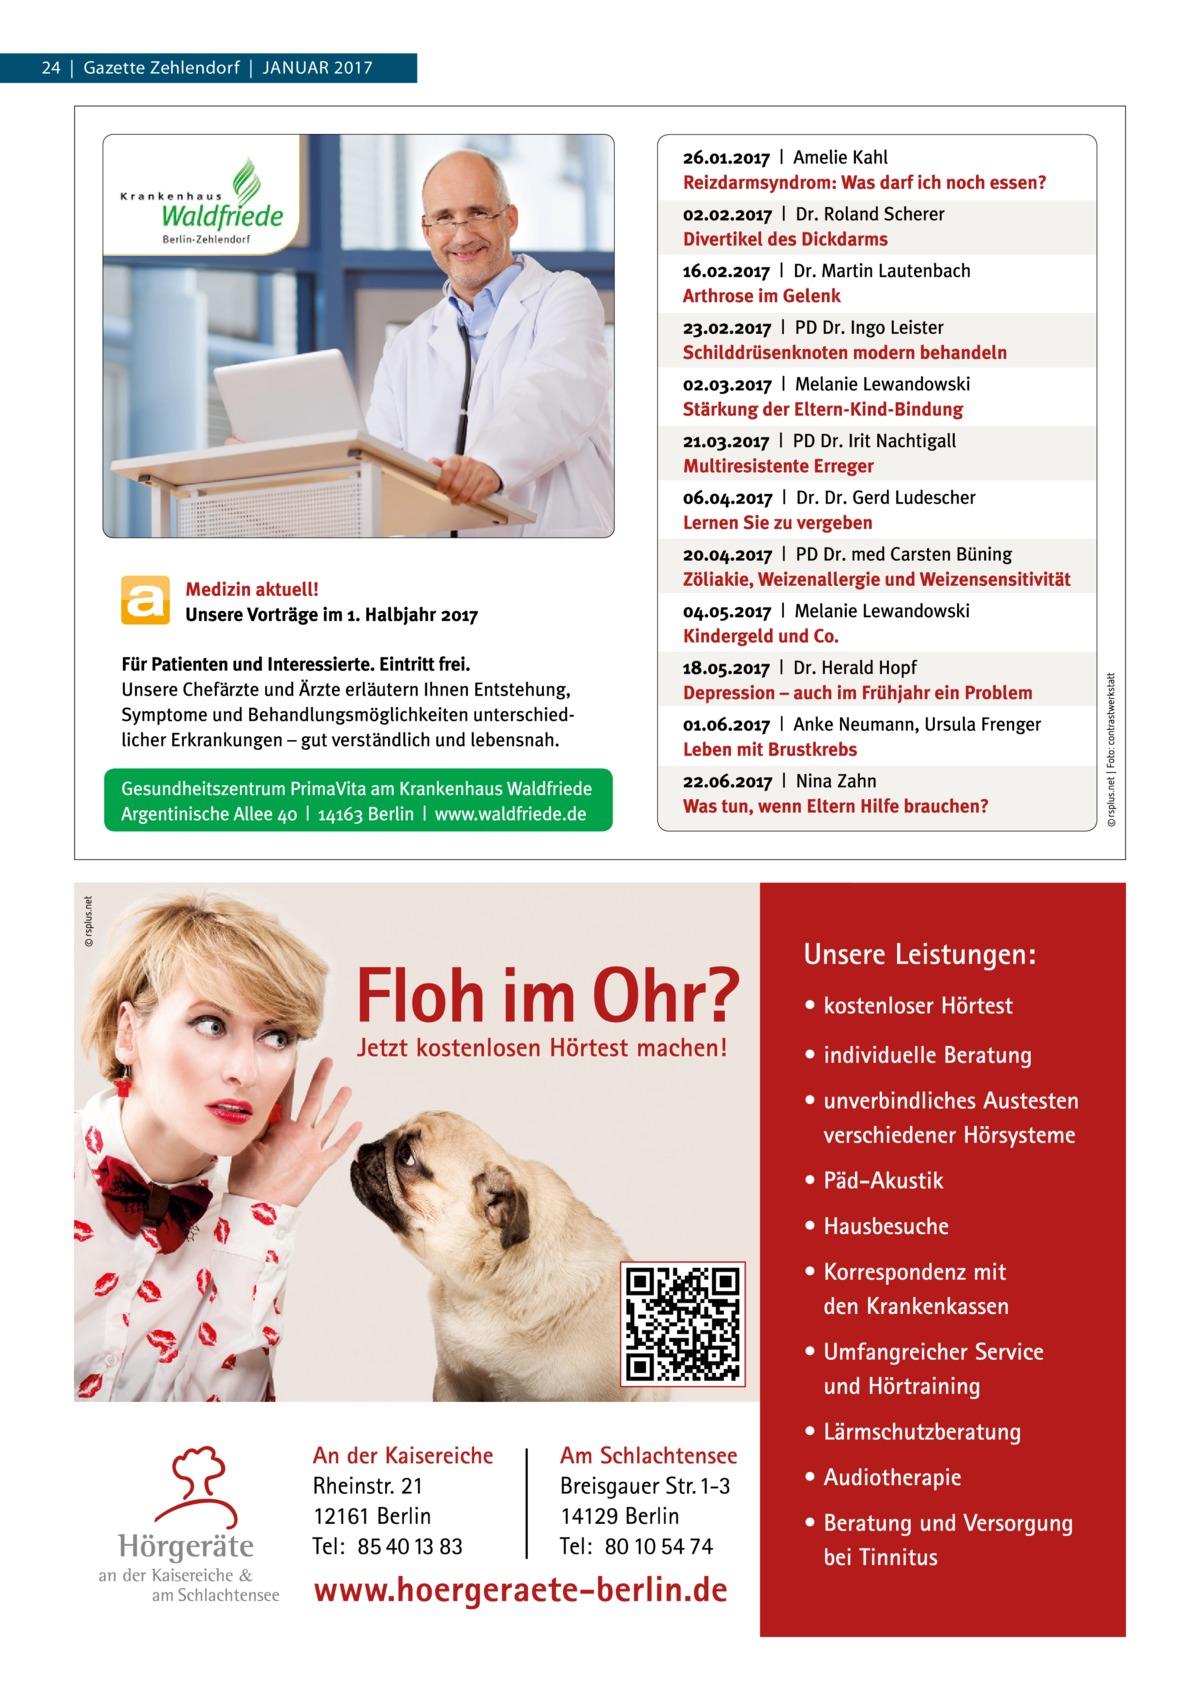 24 Gazette Zehlendorf Januar 2017